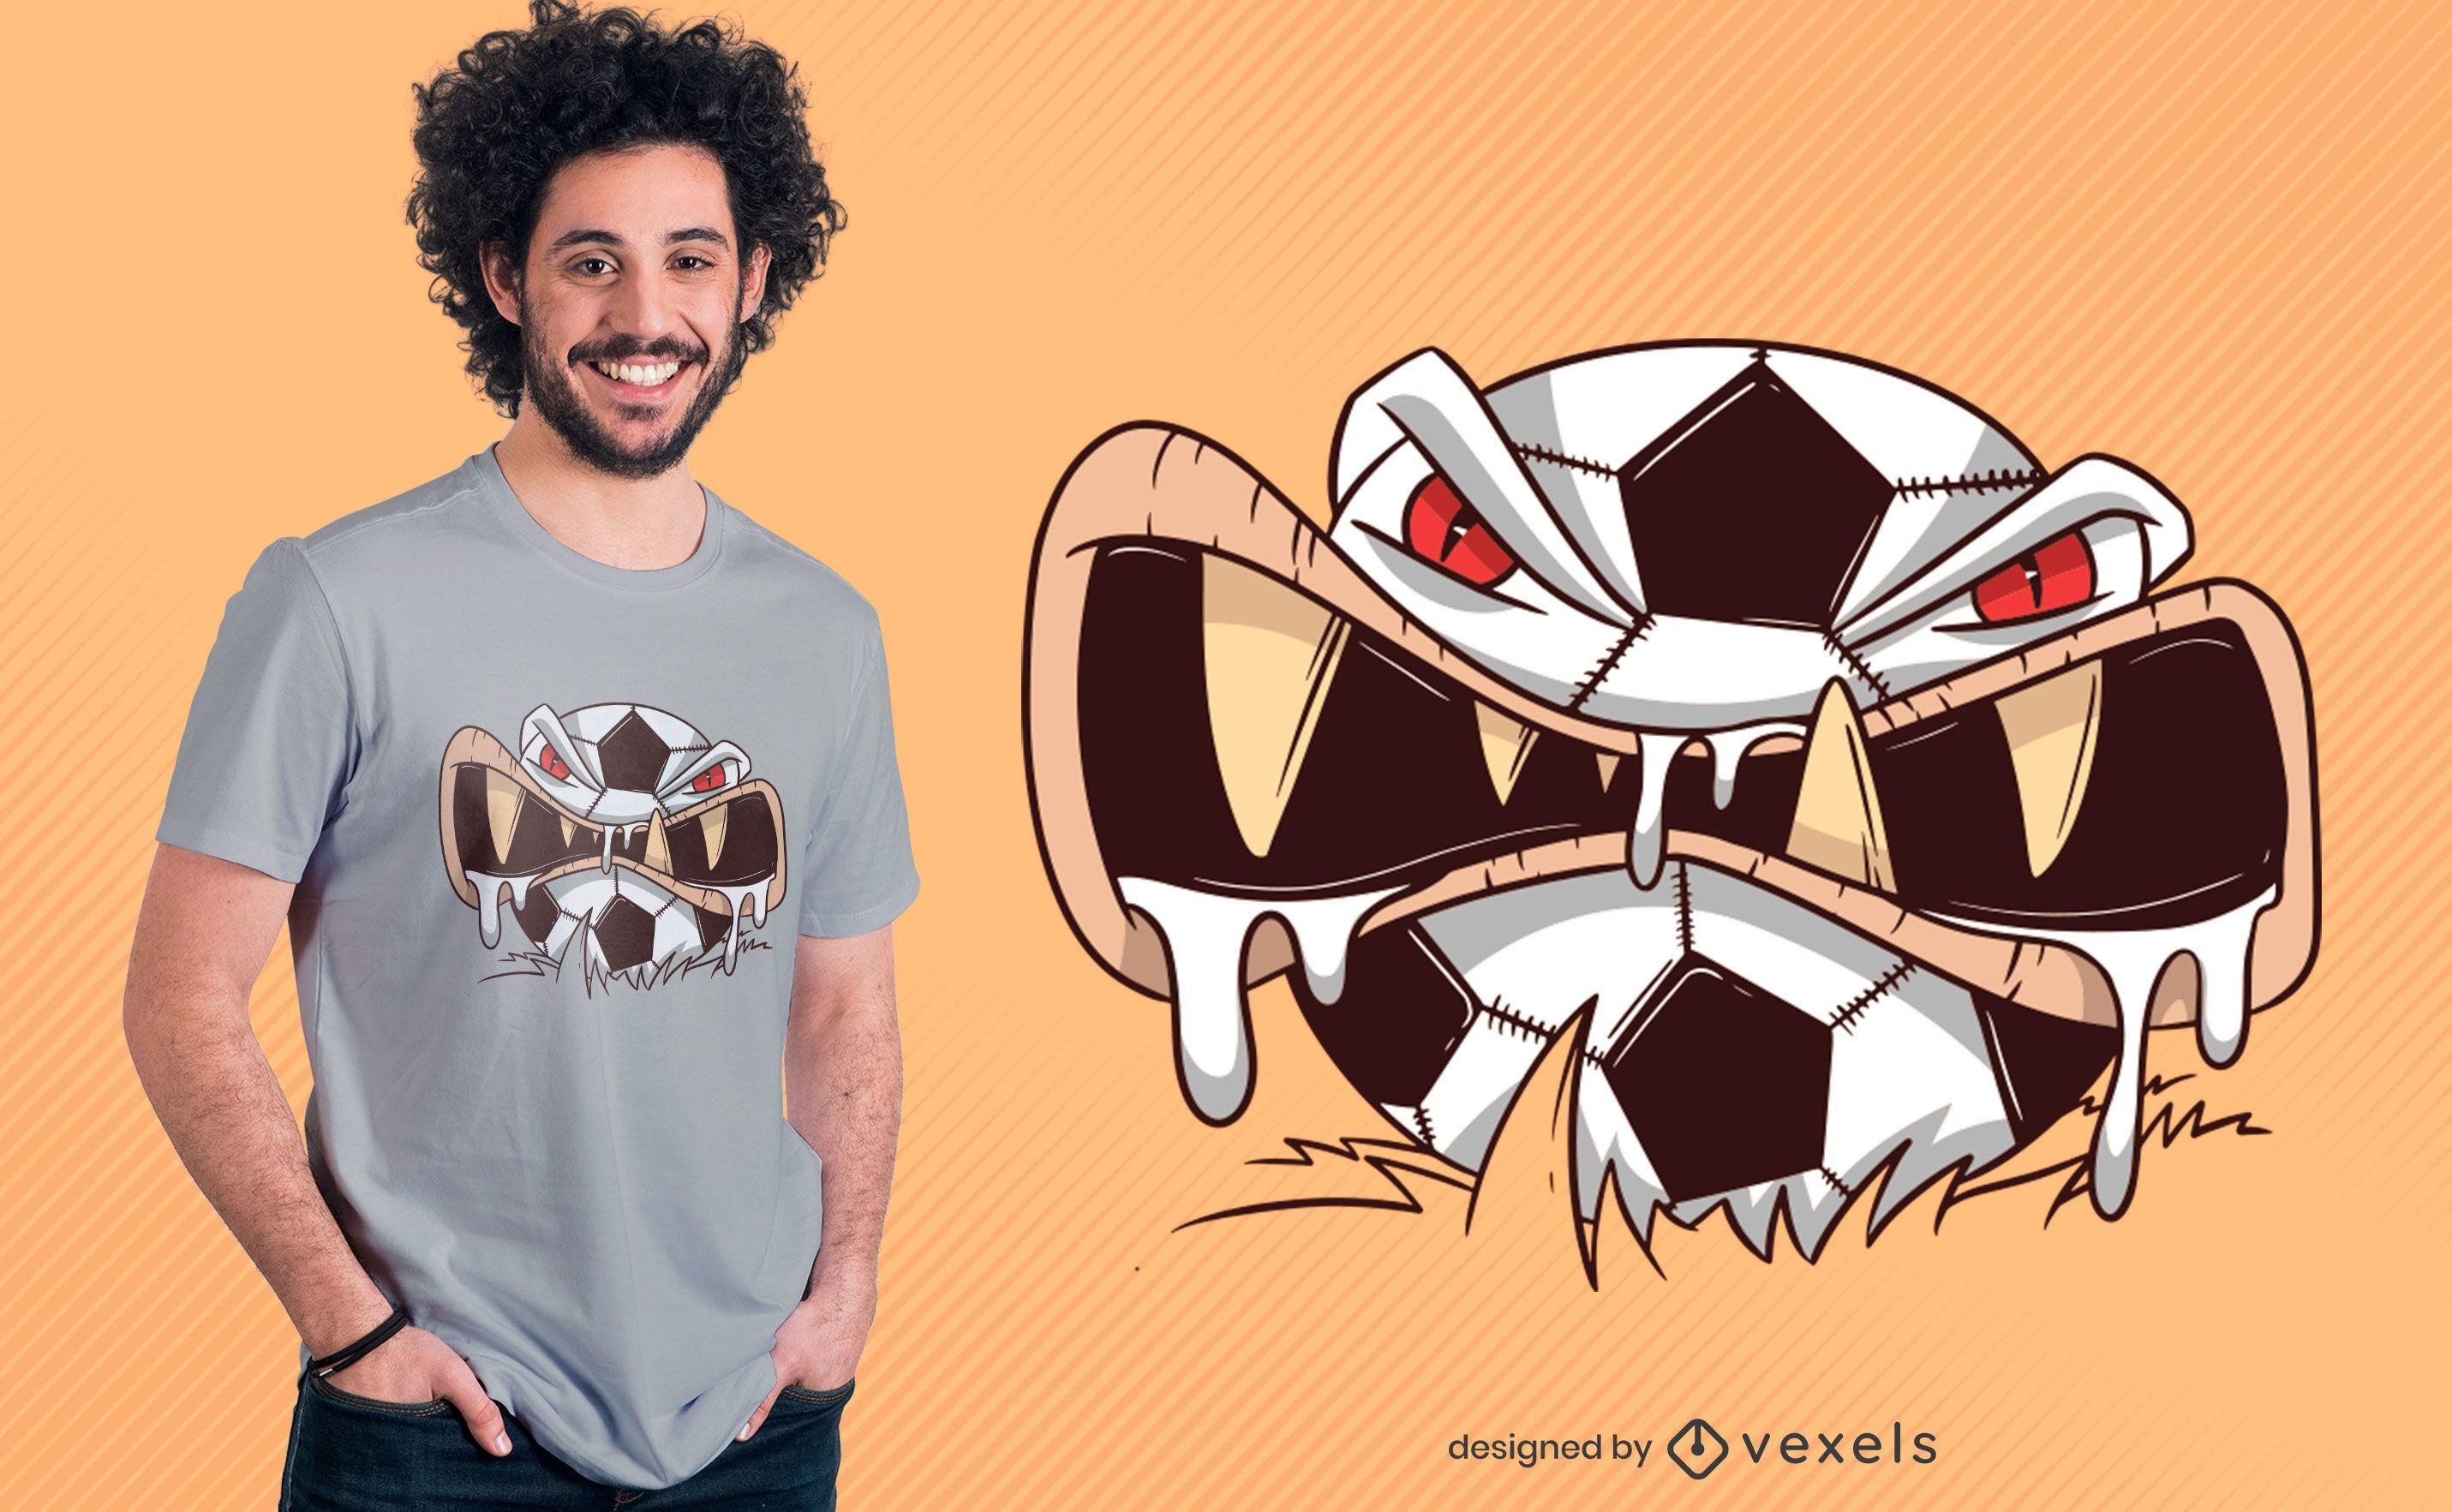 Mad football t-shirt design